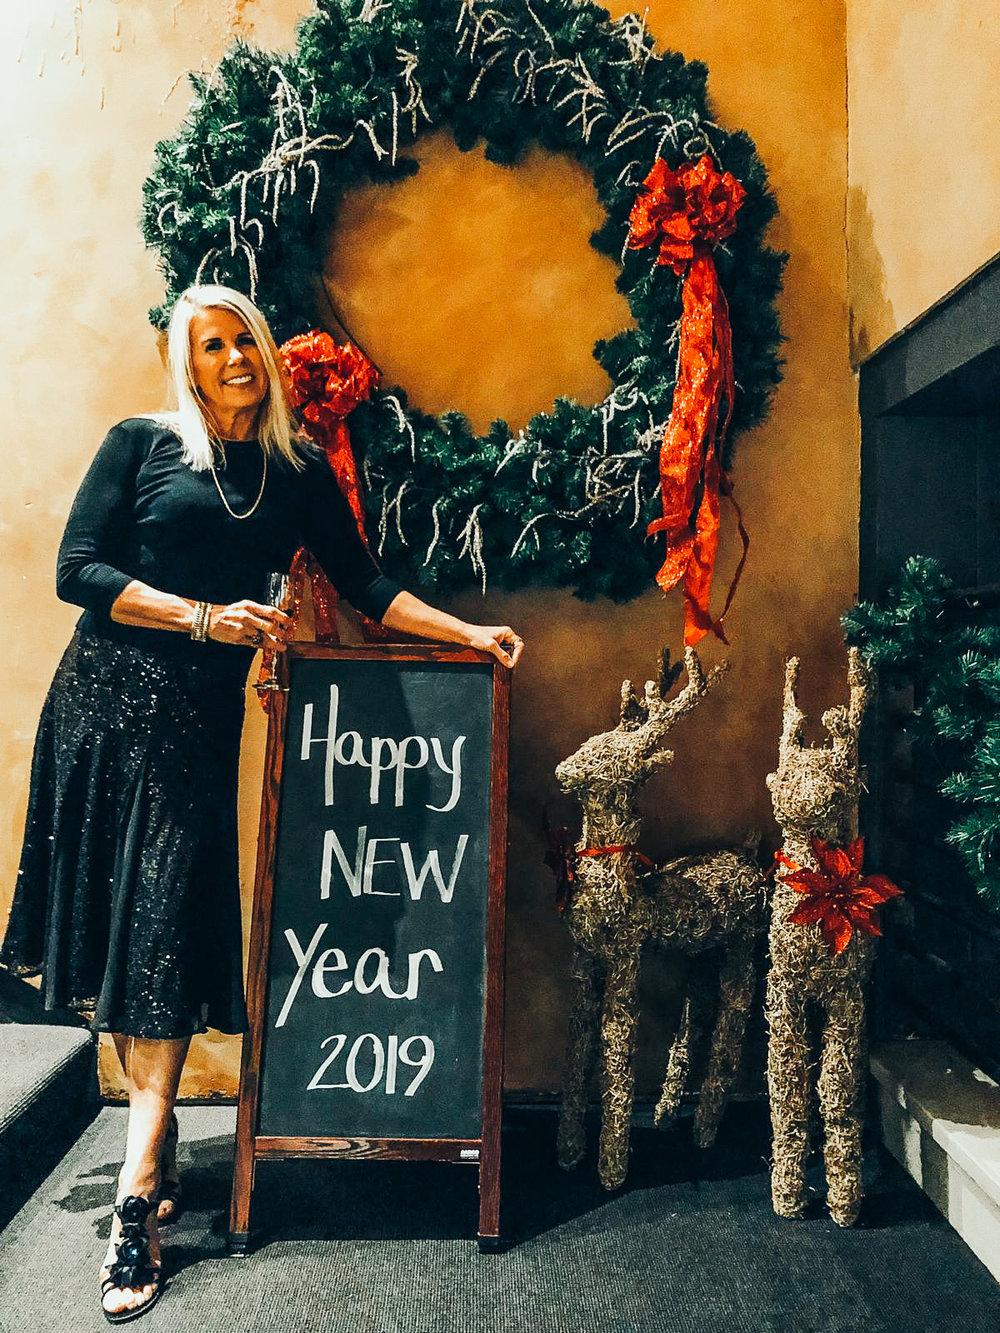 servino-tiburon-christmas-new years eve-local-festive-family-time-9.jpg